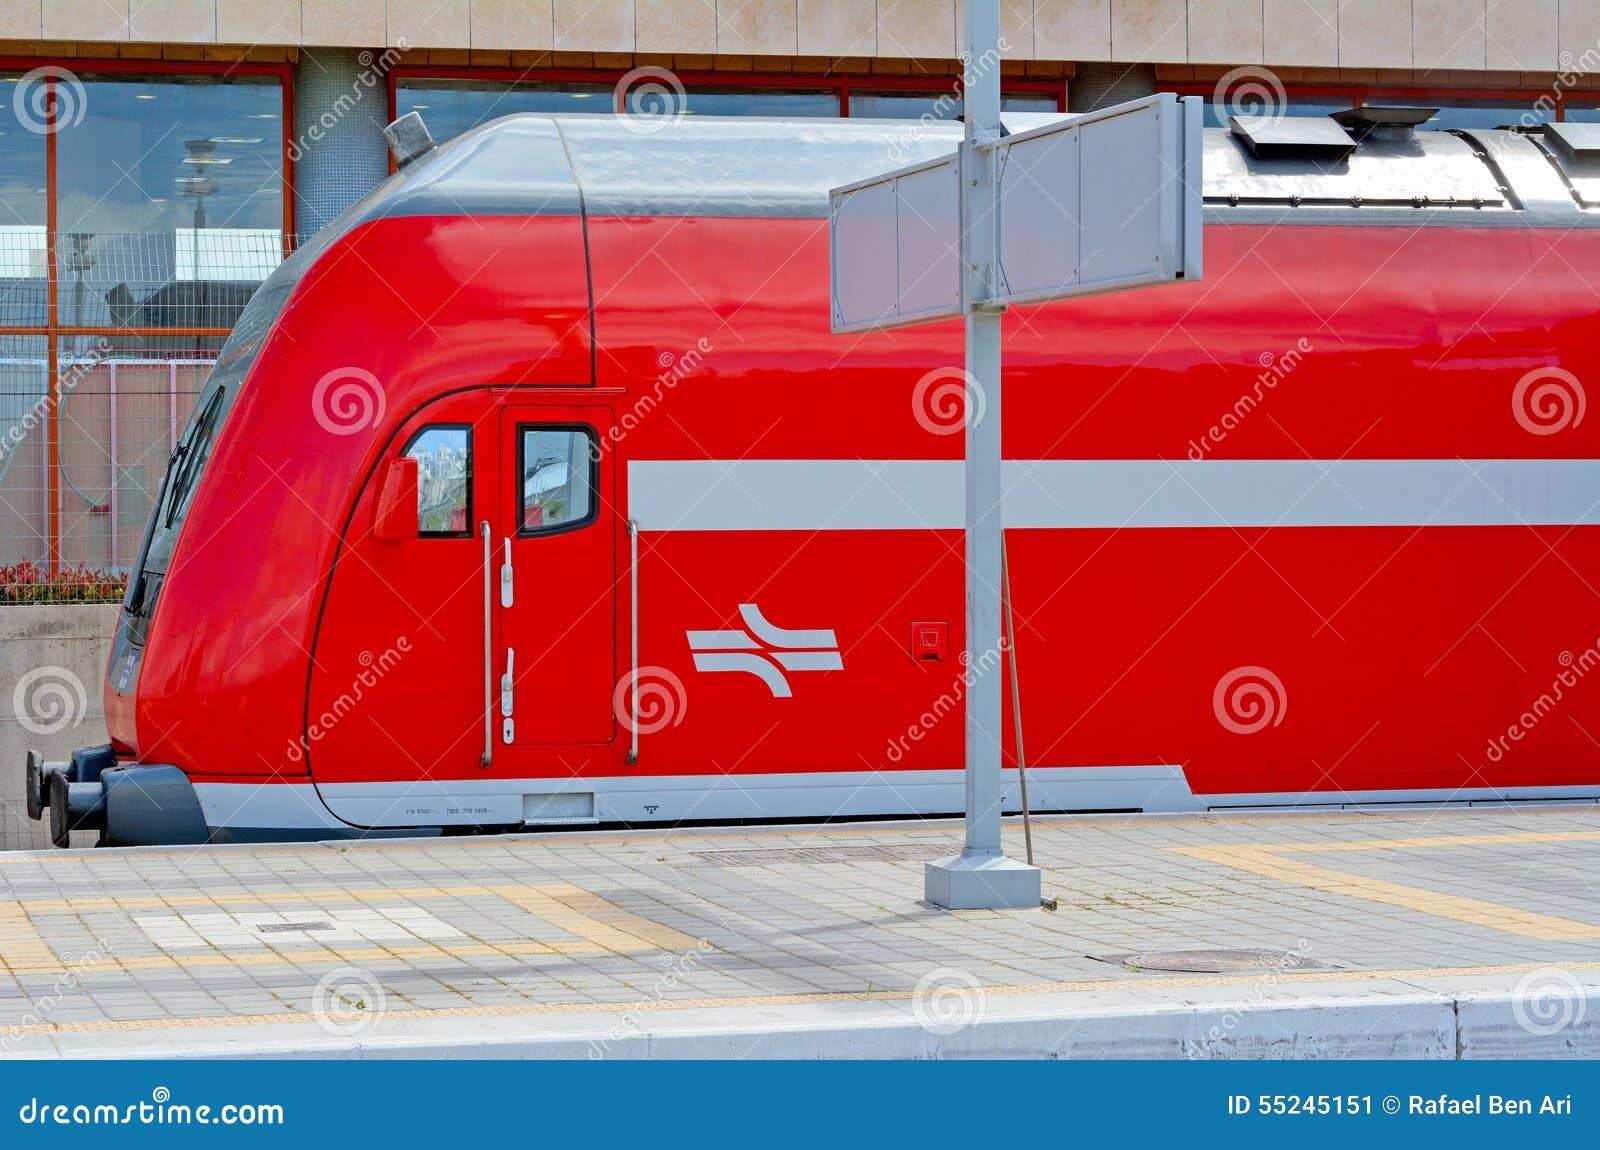 a586e3b778 TEL AVIV - APR 01 2015 An Israeli Bombardier double-deck coach in Tel Aiv